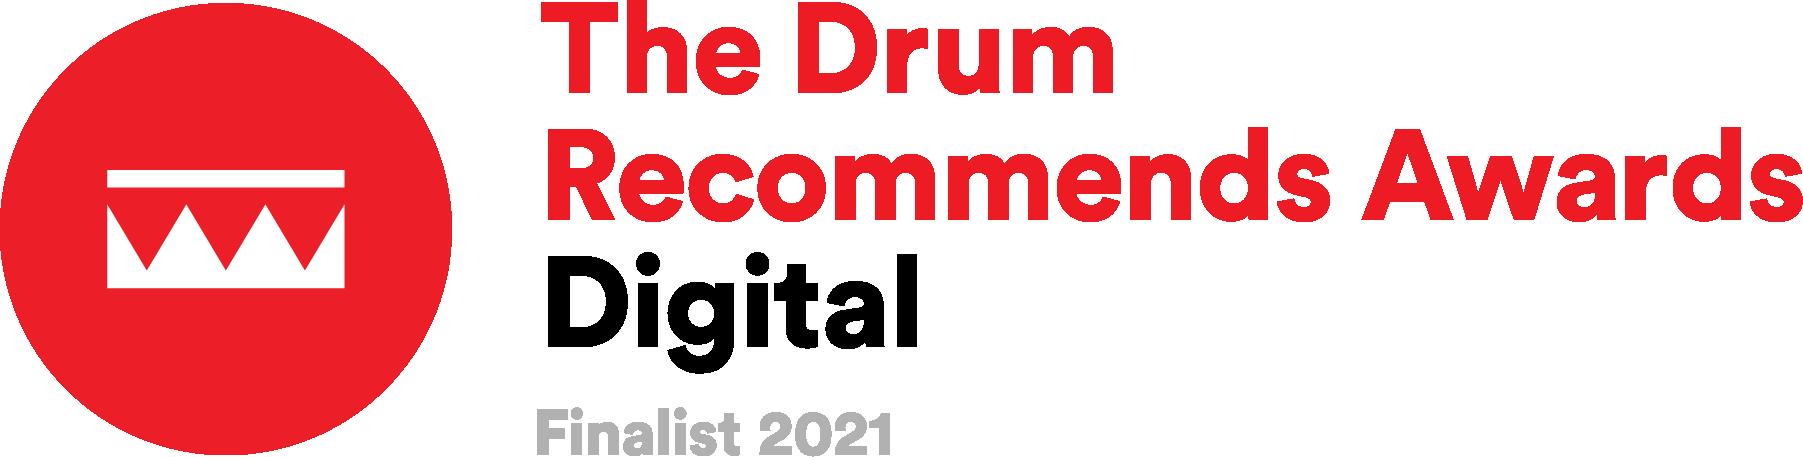 Drum Recommends Finalist 2021